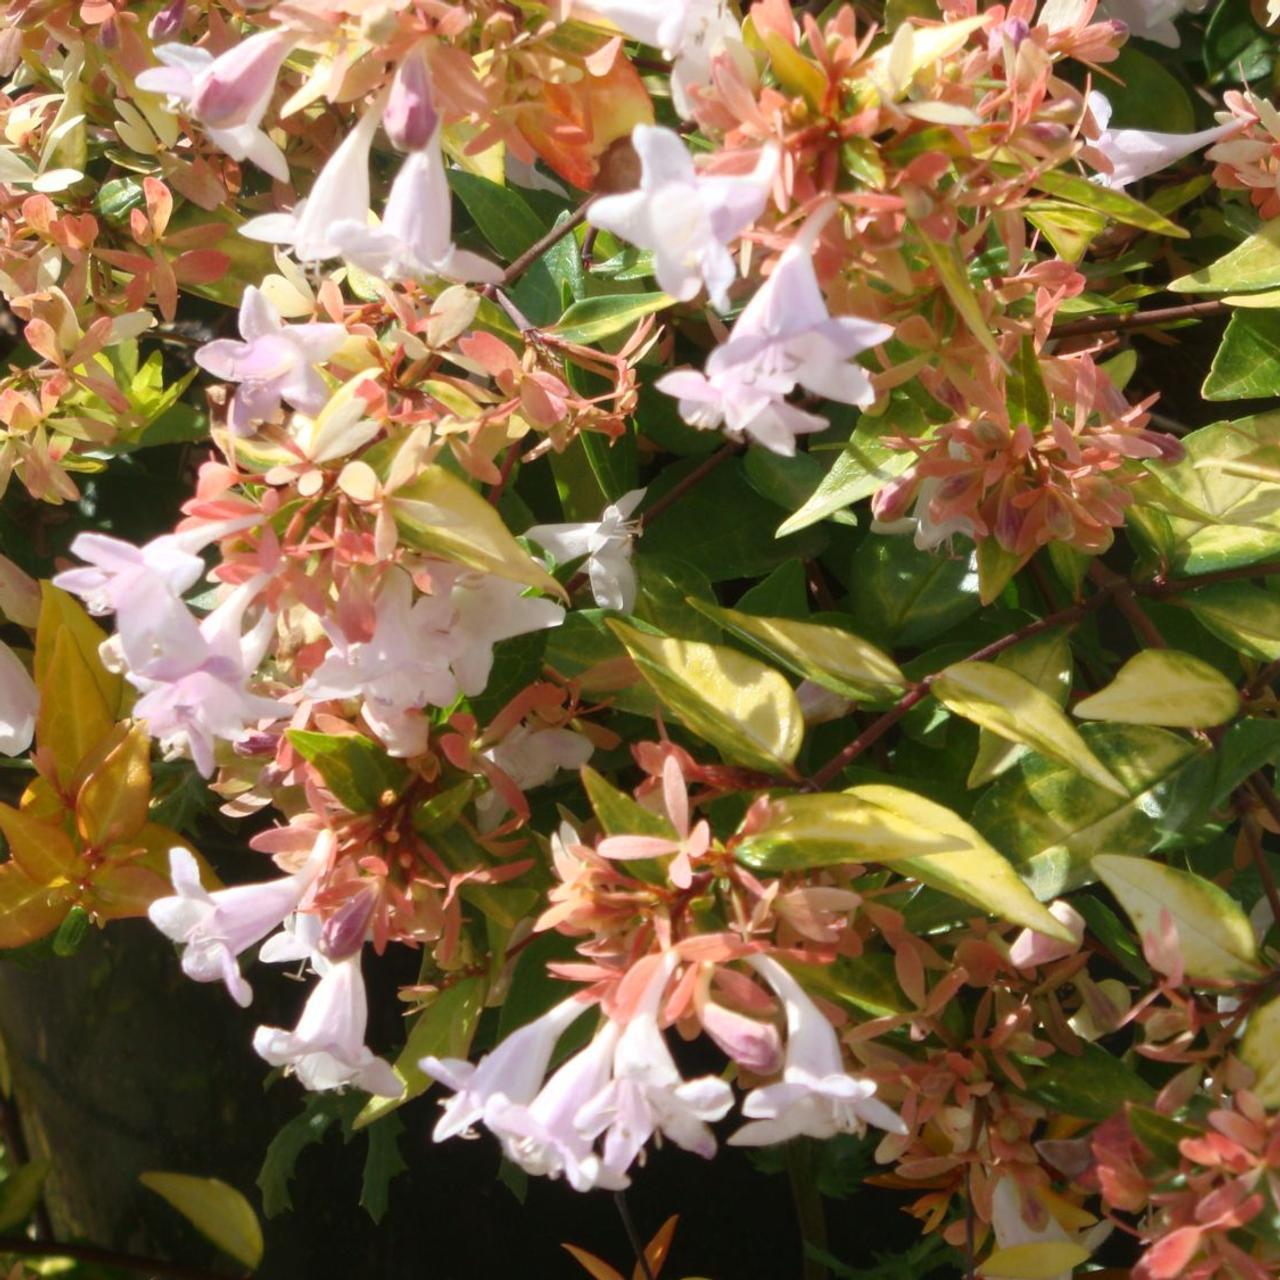 Abelia x grandiflora 'Francis Mason' plant